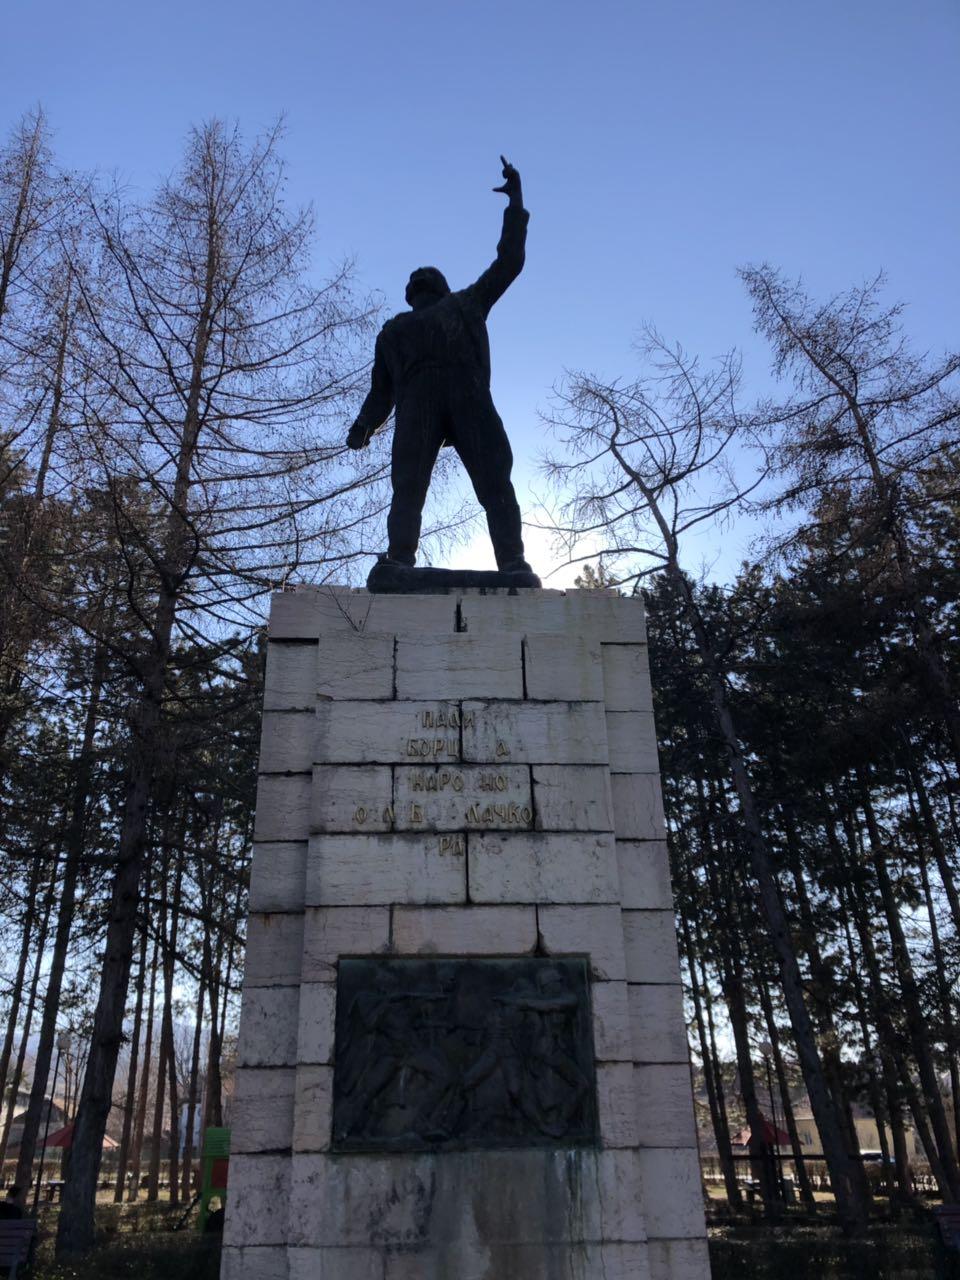 Spomenik u parku još uvek čeka na rekonstrukciju